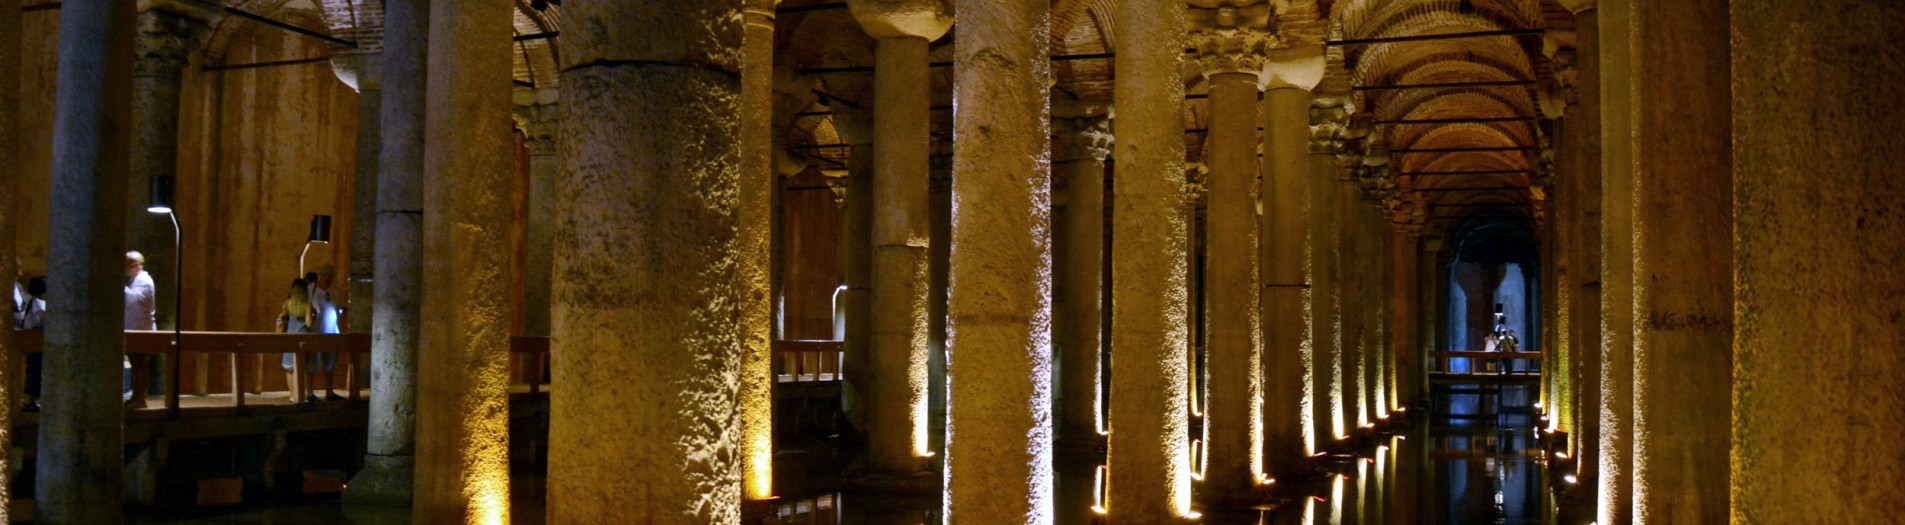 The Basilic Cistern